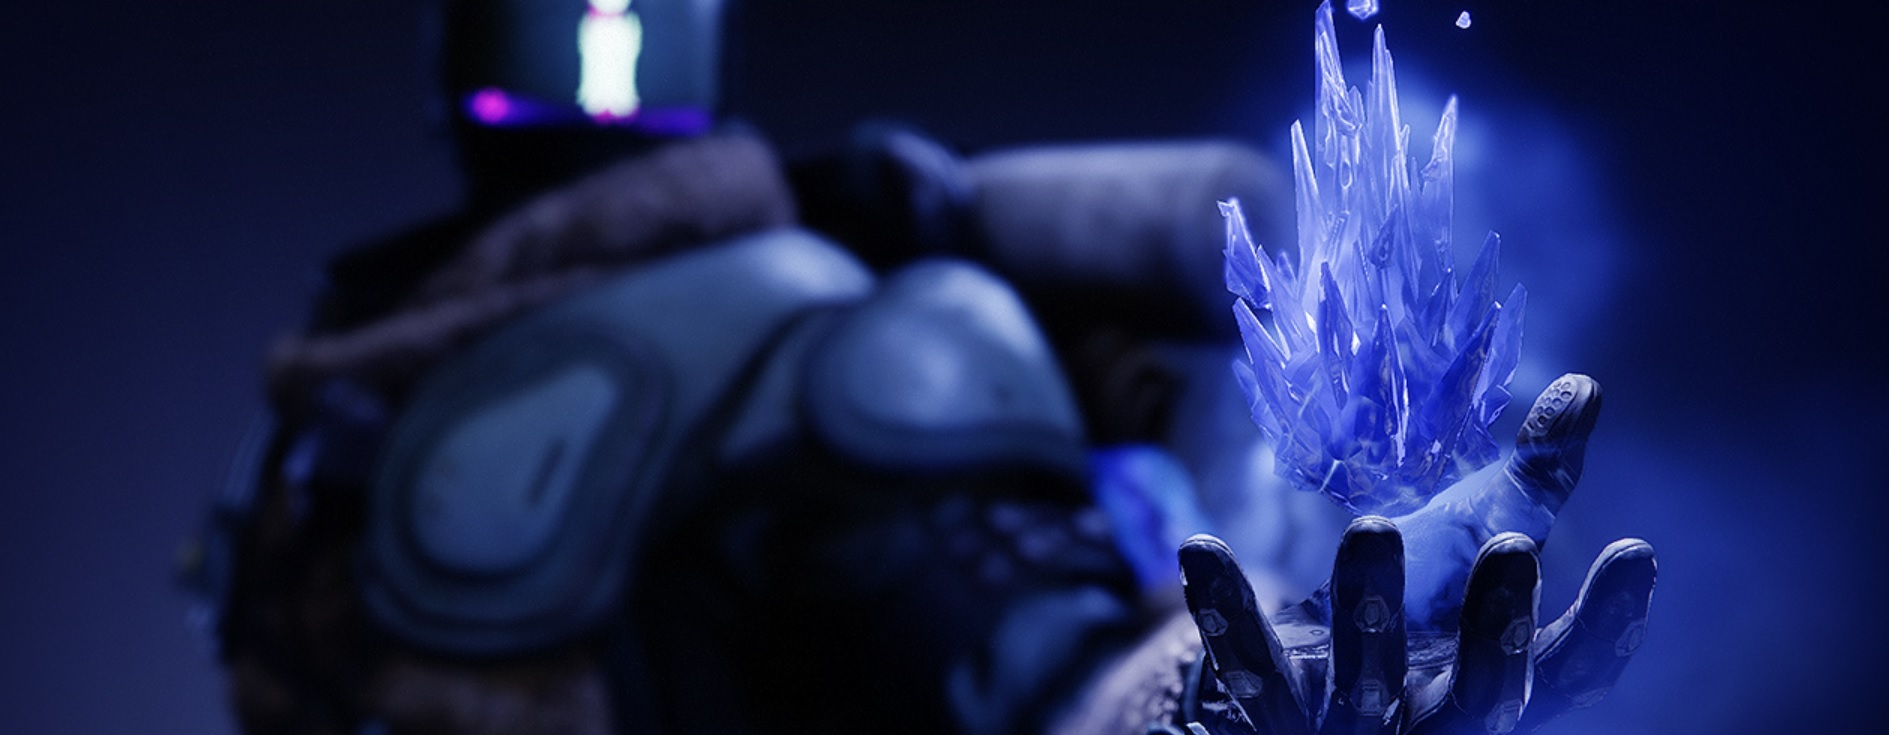 Bungie pulls back the curtain on Destiny 2's new Warlock subclass screenshot